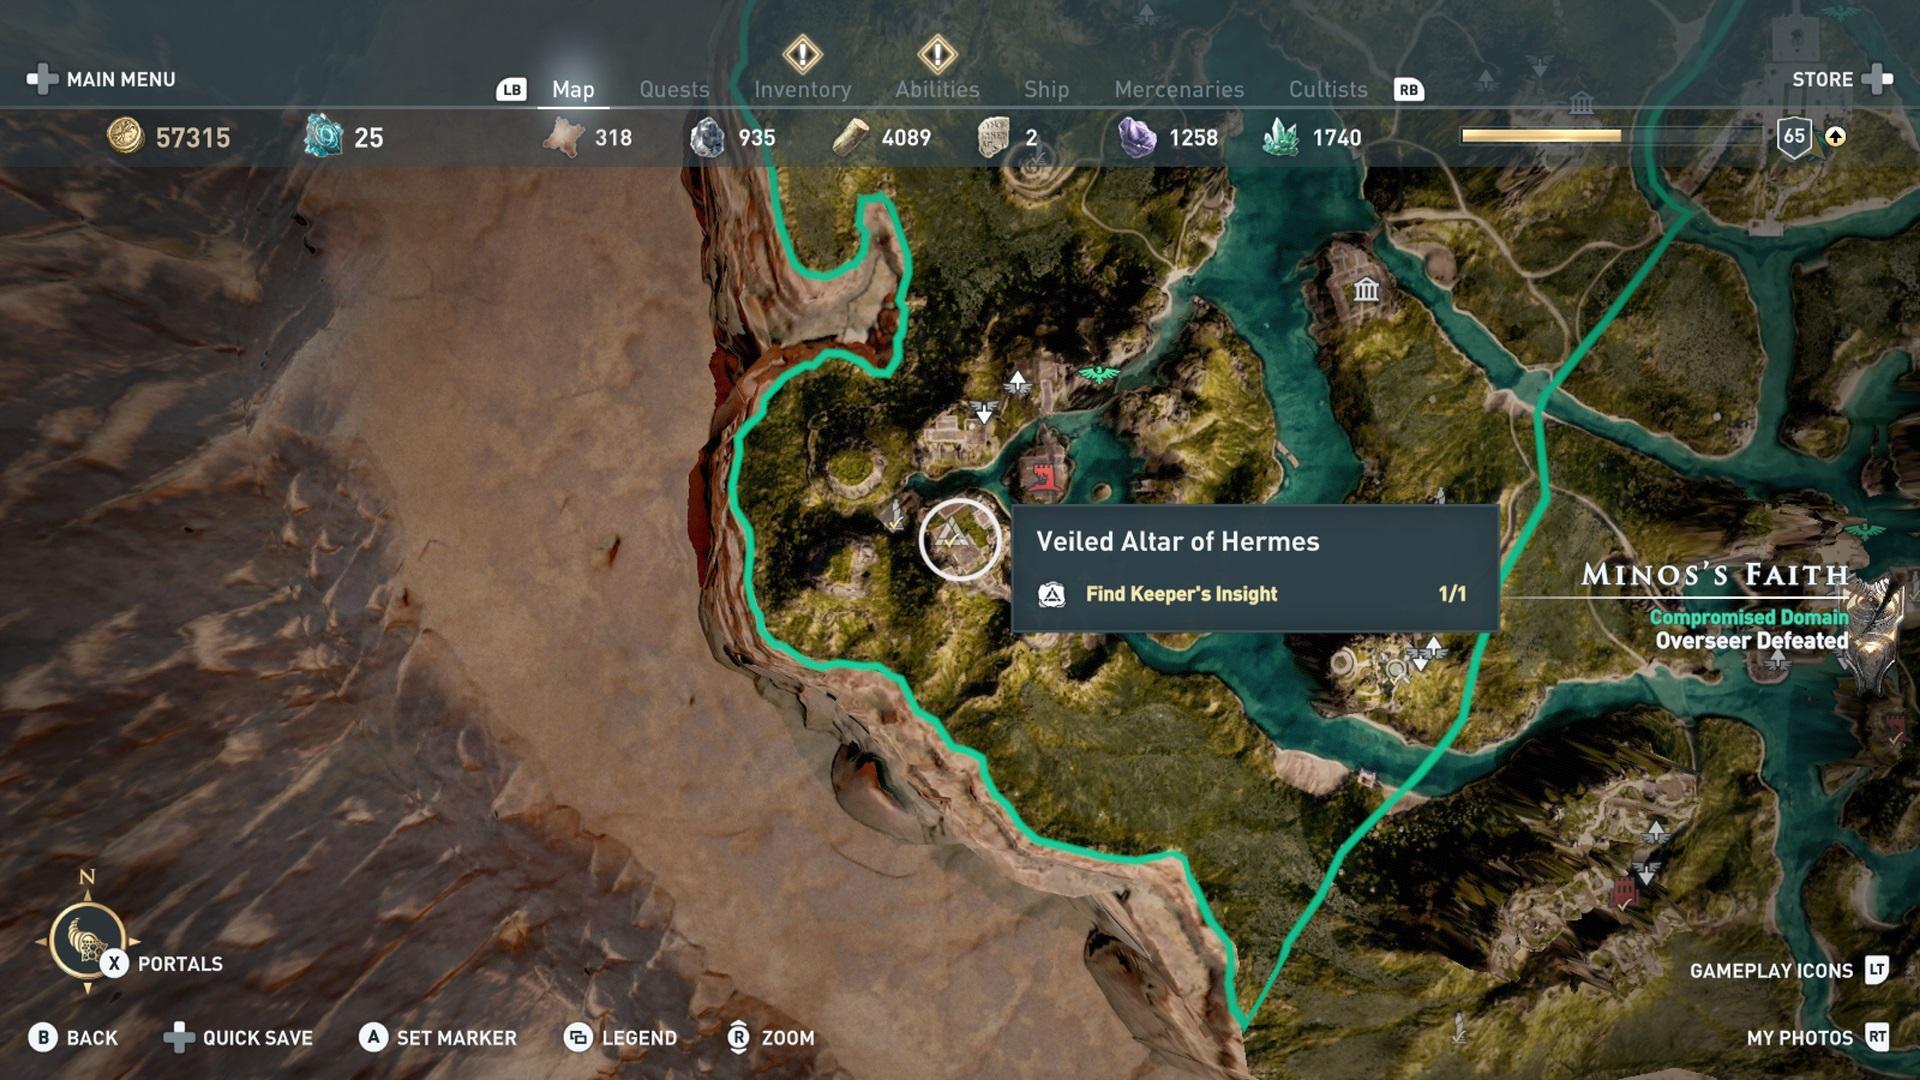 Assassin S Creed Odyssey Achievement Guide Road Map Xboxachievements Com